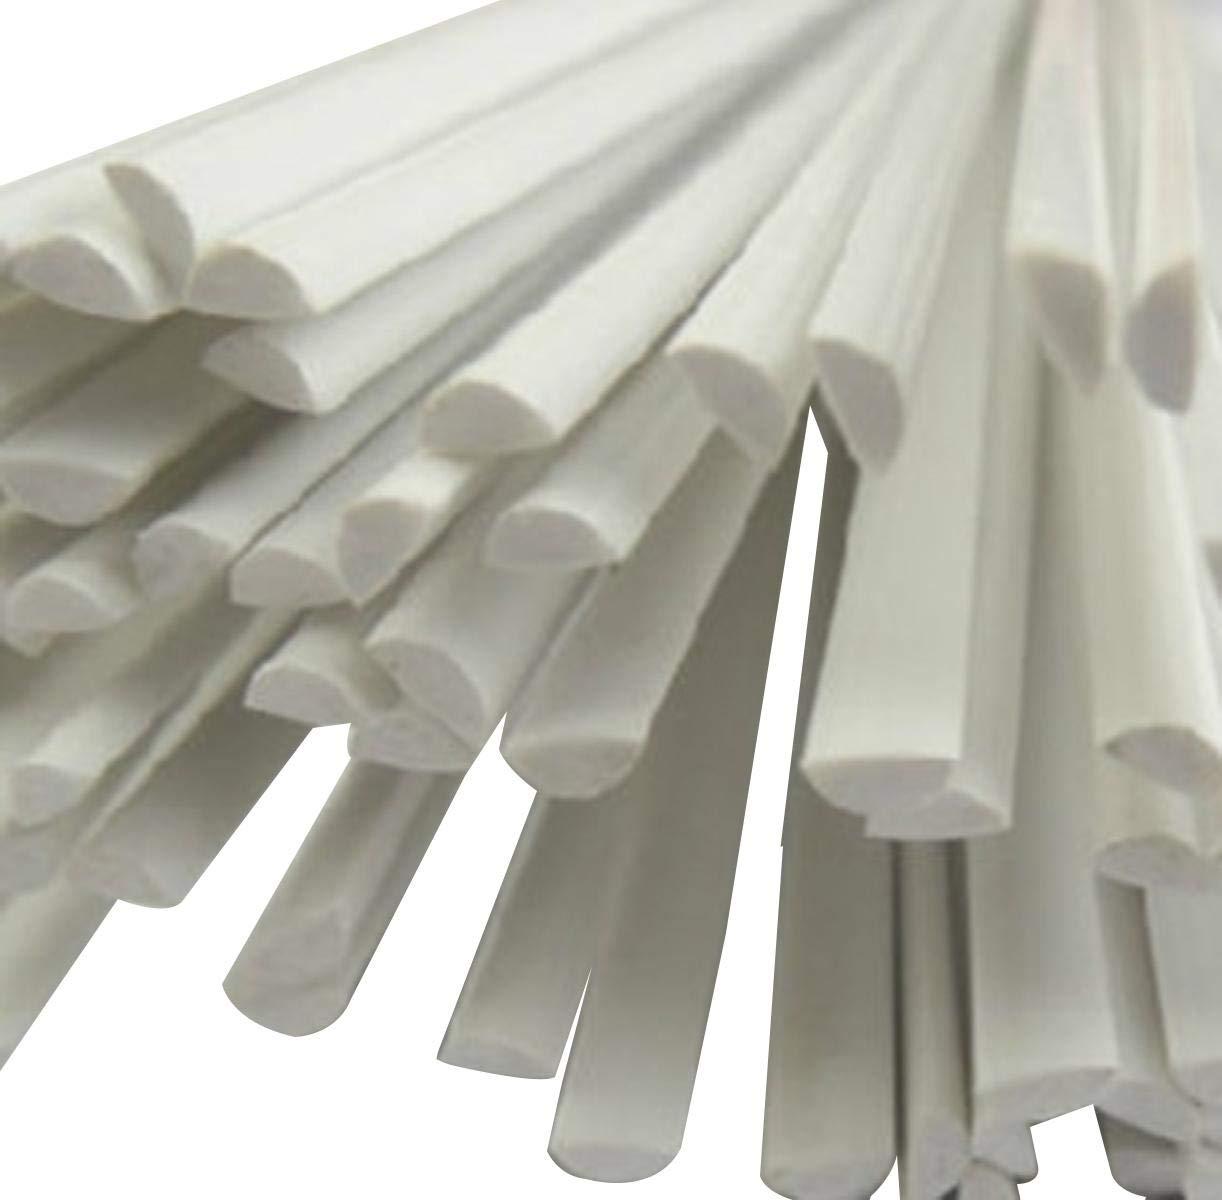 9.85 Long White 20pcs ABS Styrene Plastic Half Round Bar Rod 2mm Dia